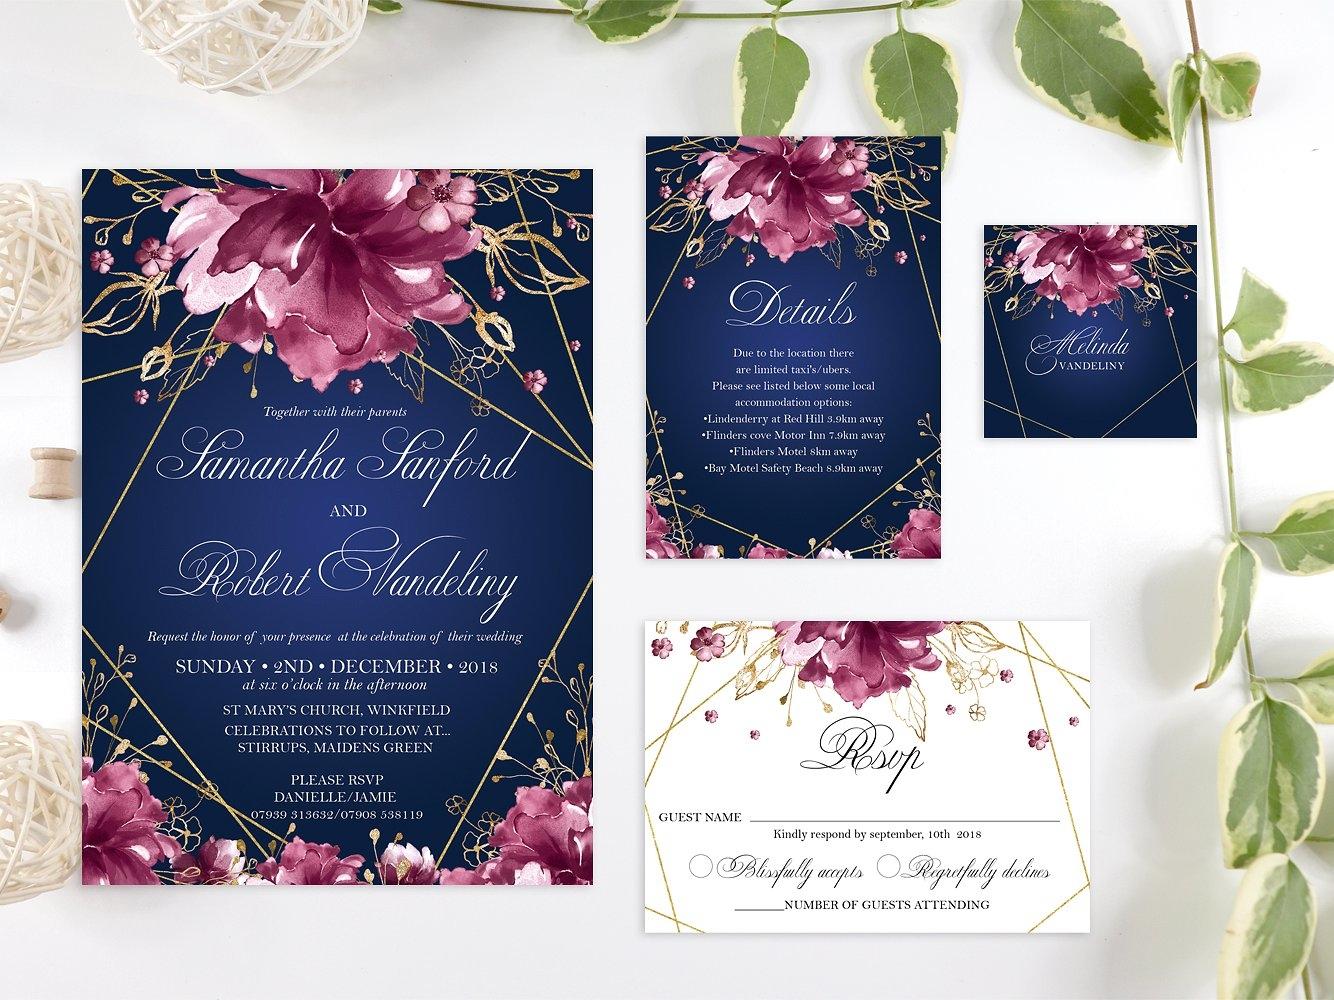 Burgundy And Gold Wedding Invitations: Navy, Burgundy And Gold Wedding Set By Invitations